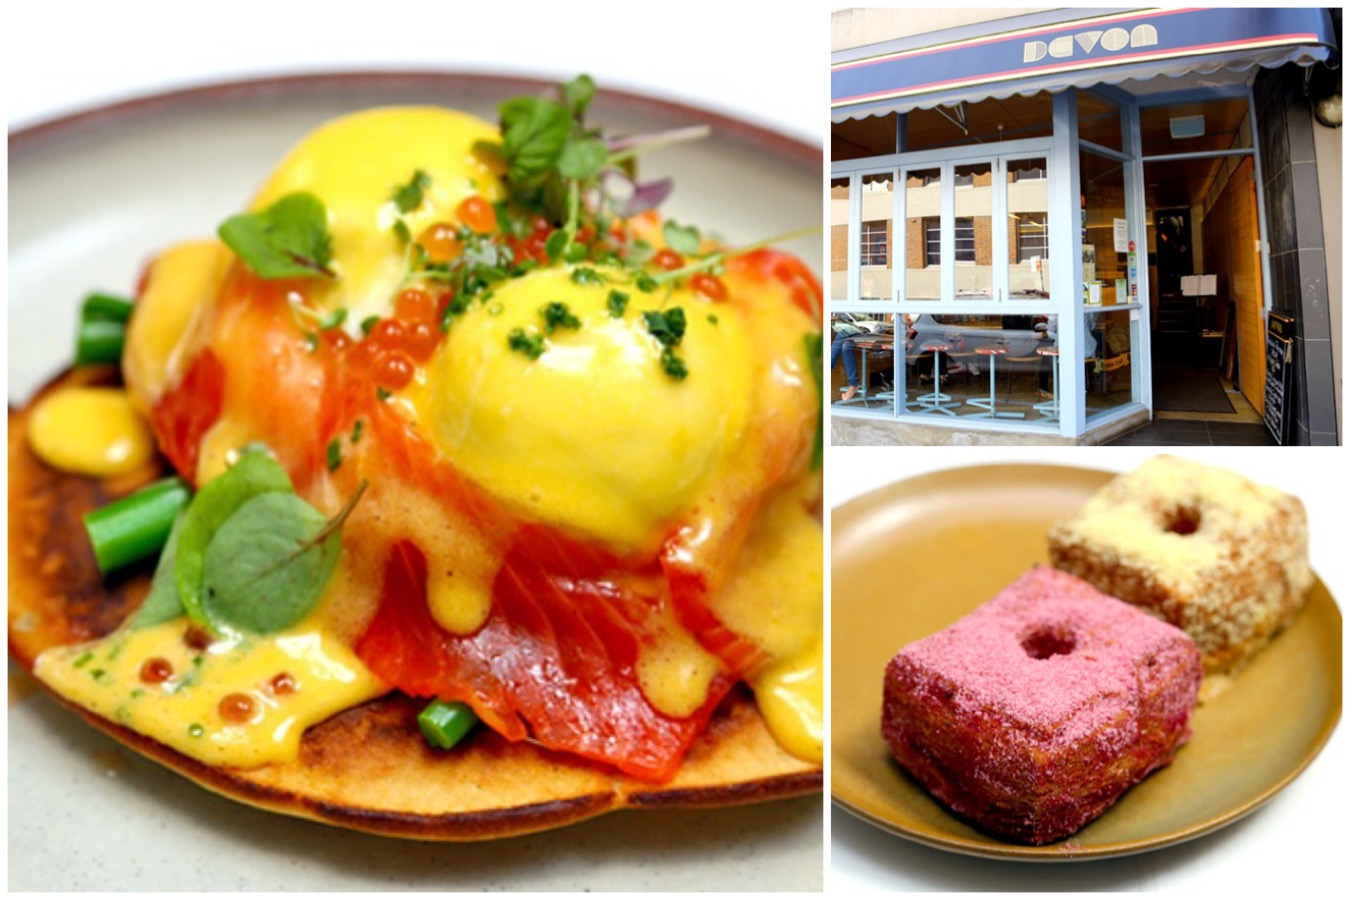 Devon Café - One Of Sydney's Best Café. Asian Fusion Food On Surry Hills, Go For The Sakuma